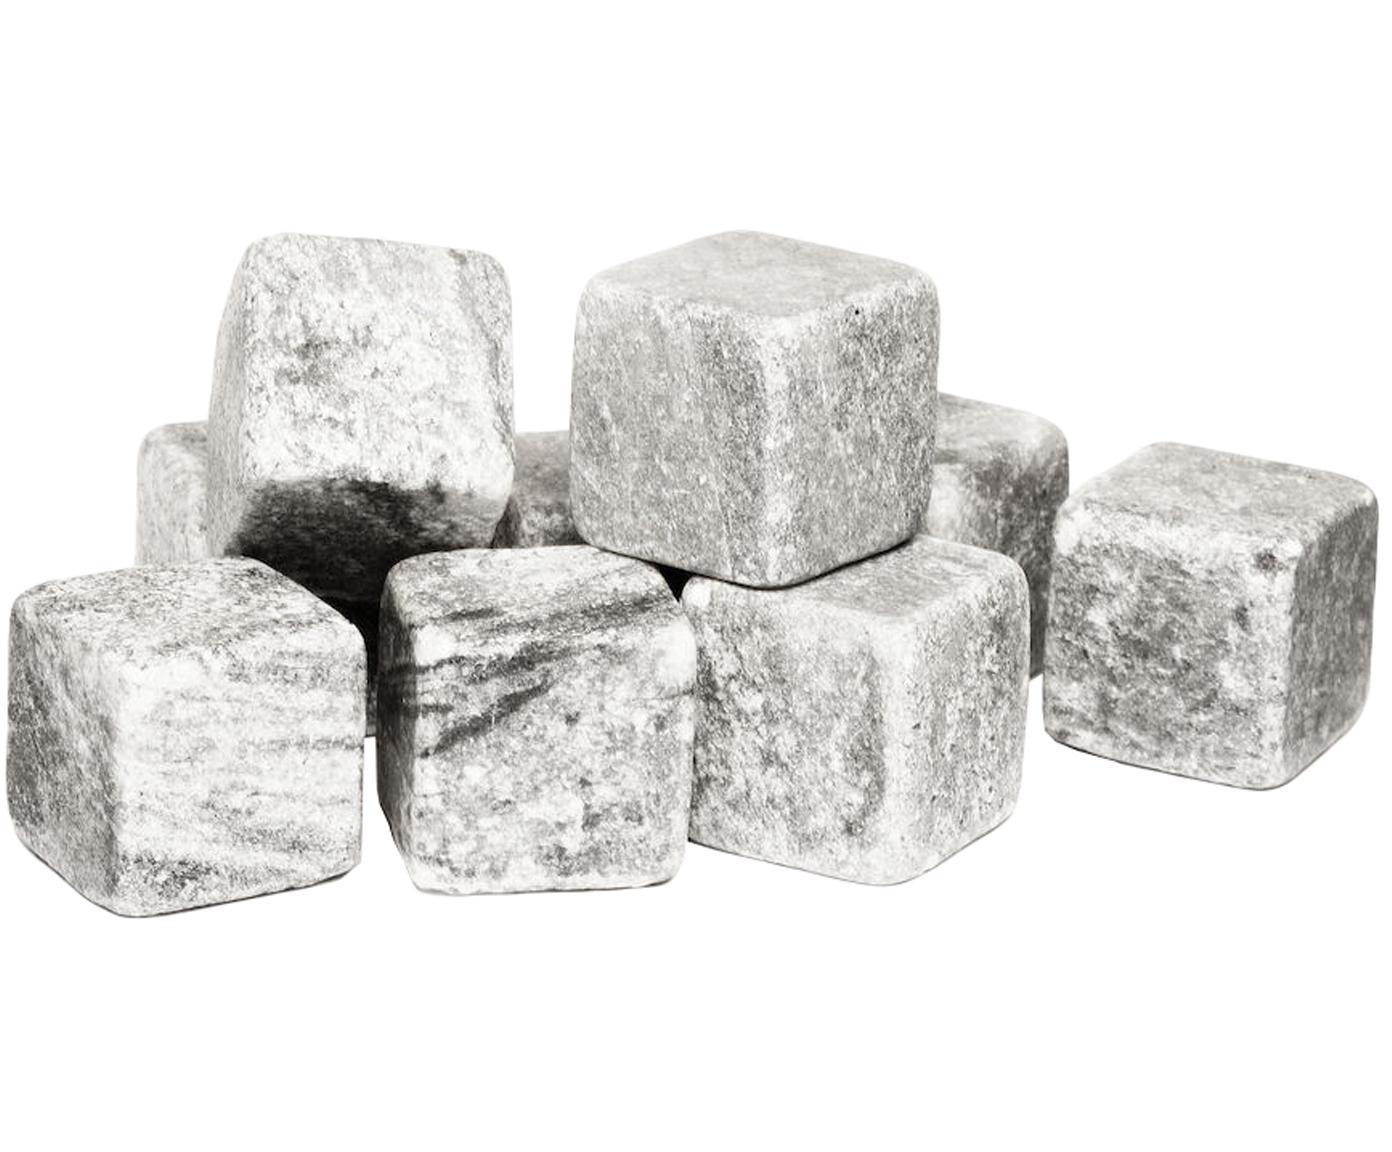 Set de piedras de whisky Rocking, 9pzas., Piedras: esteatita, Bolsa: terciopelo, Gris, An 2 x Al 2 cm